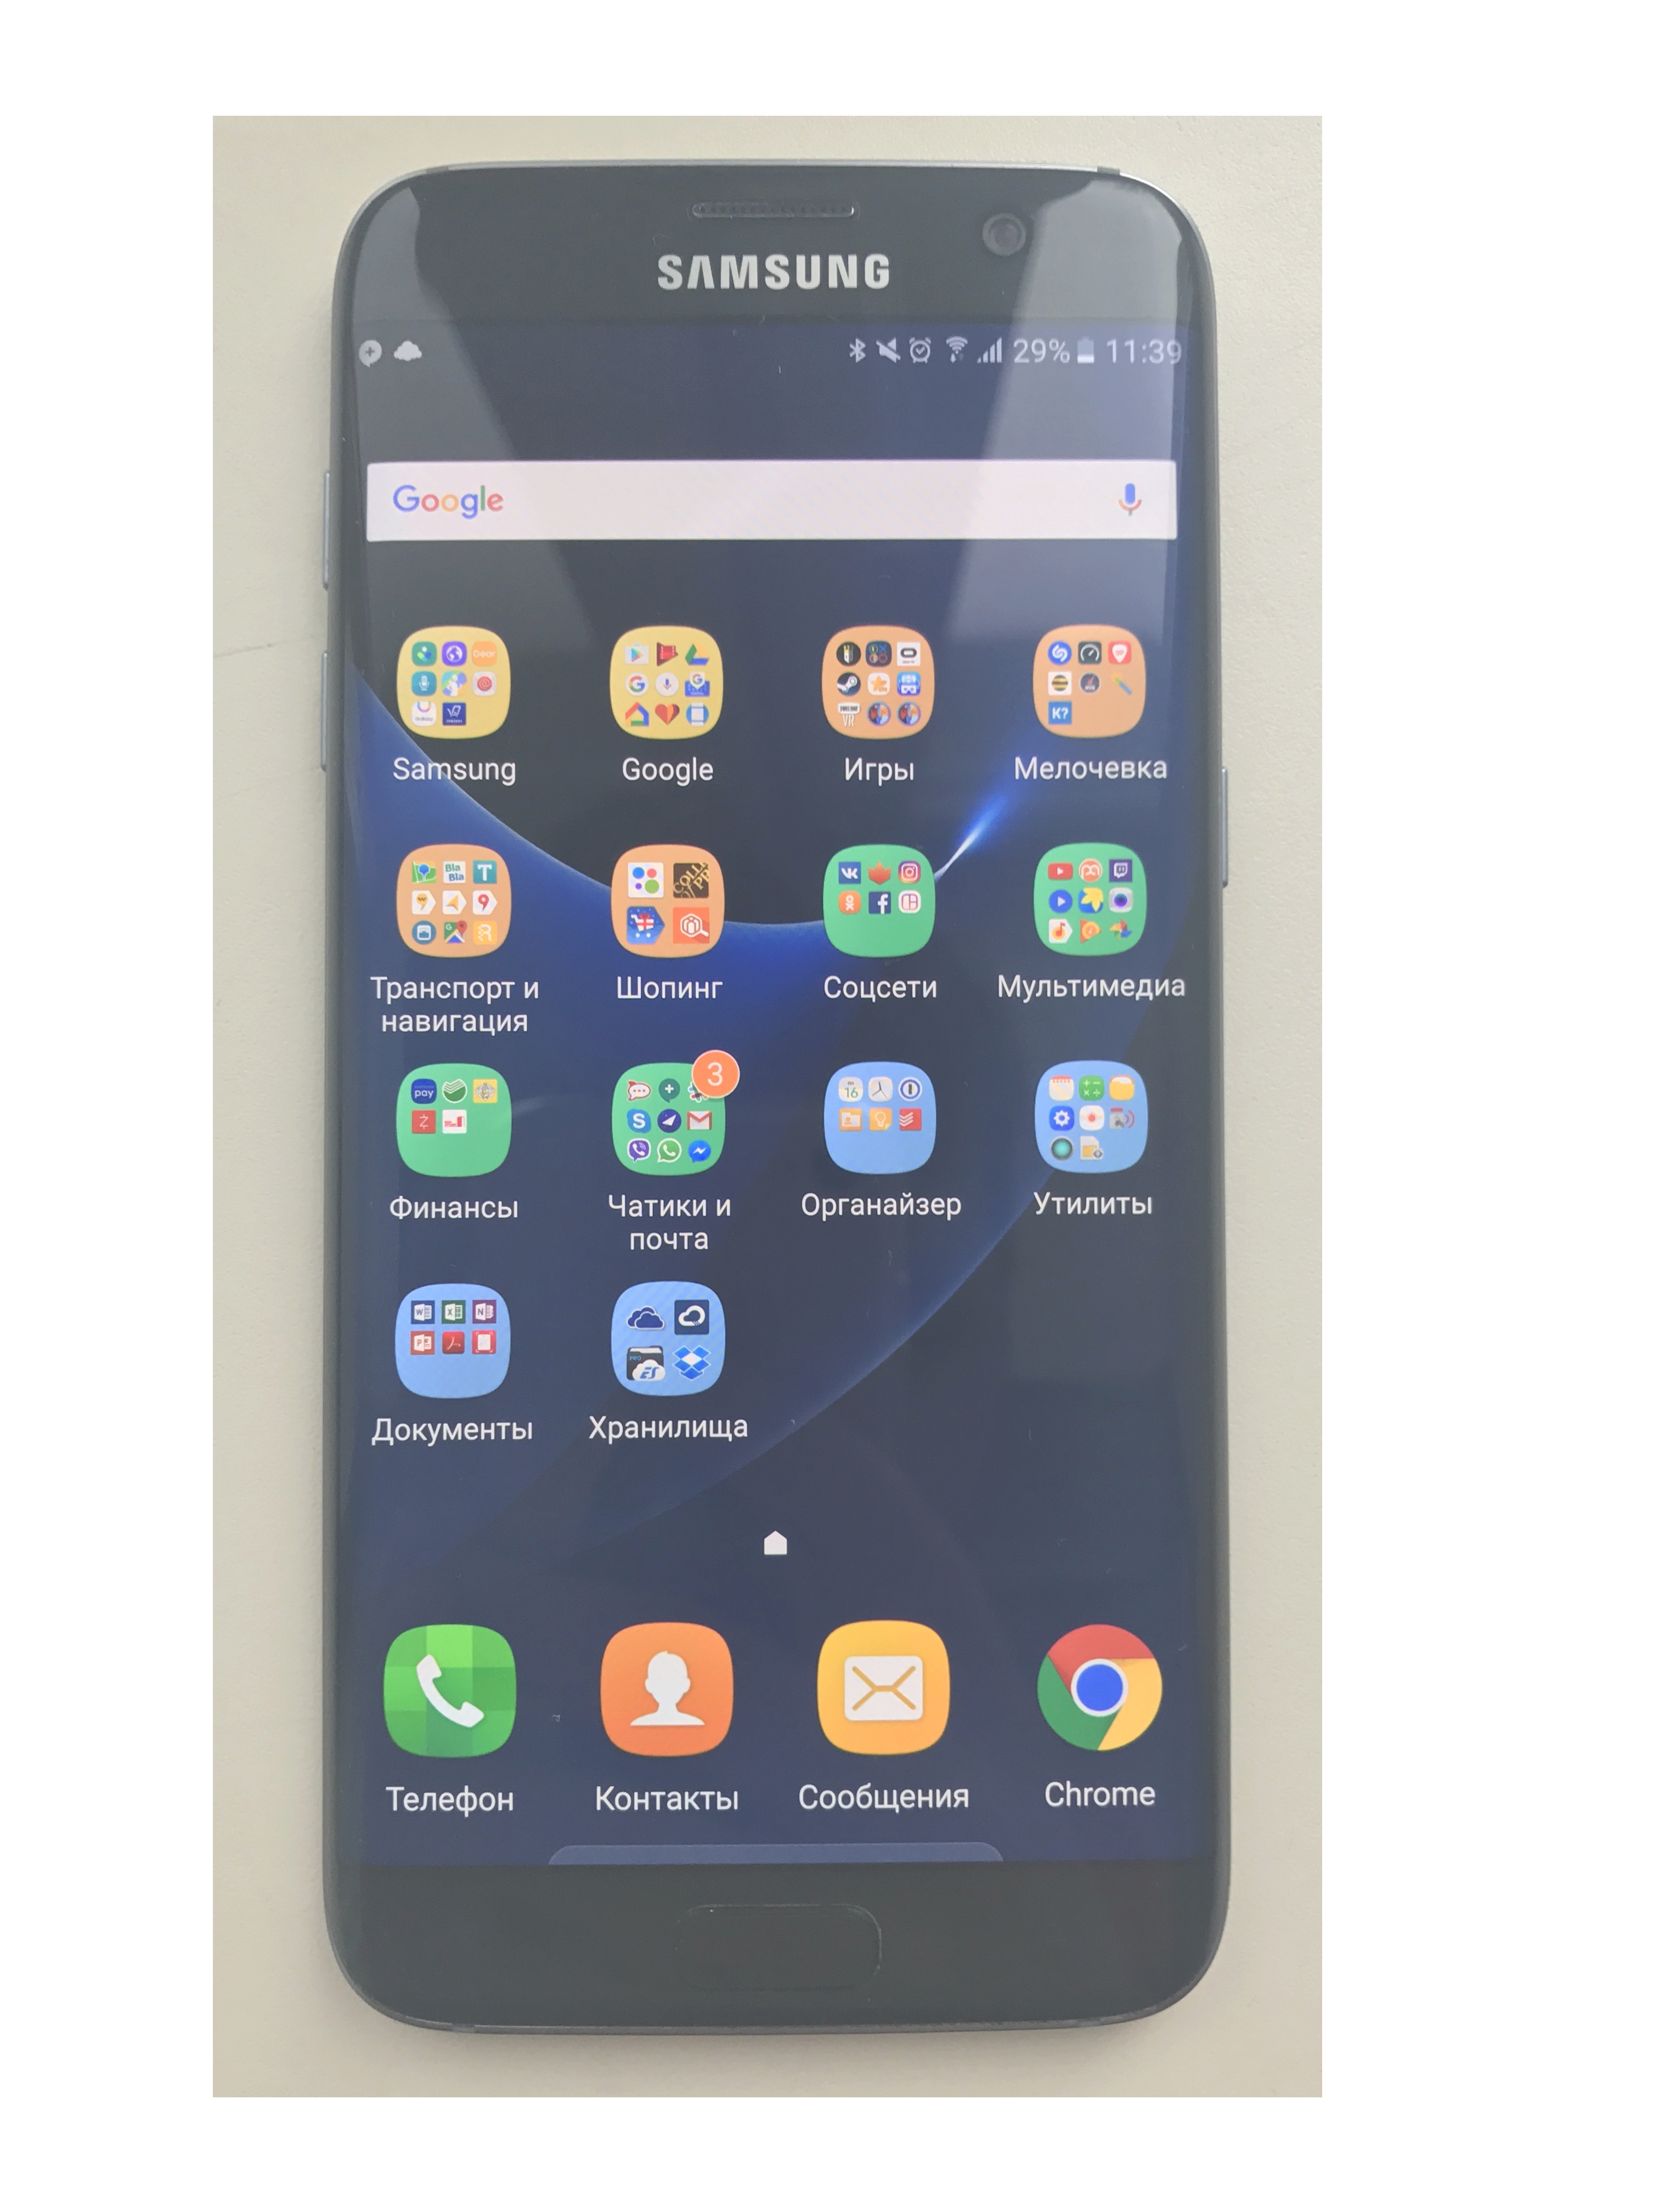 Samsung Galaxy S7 Edge в день его продажи